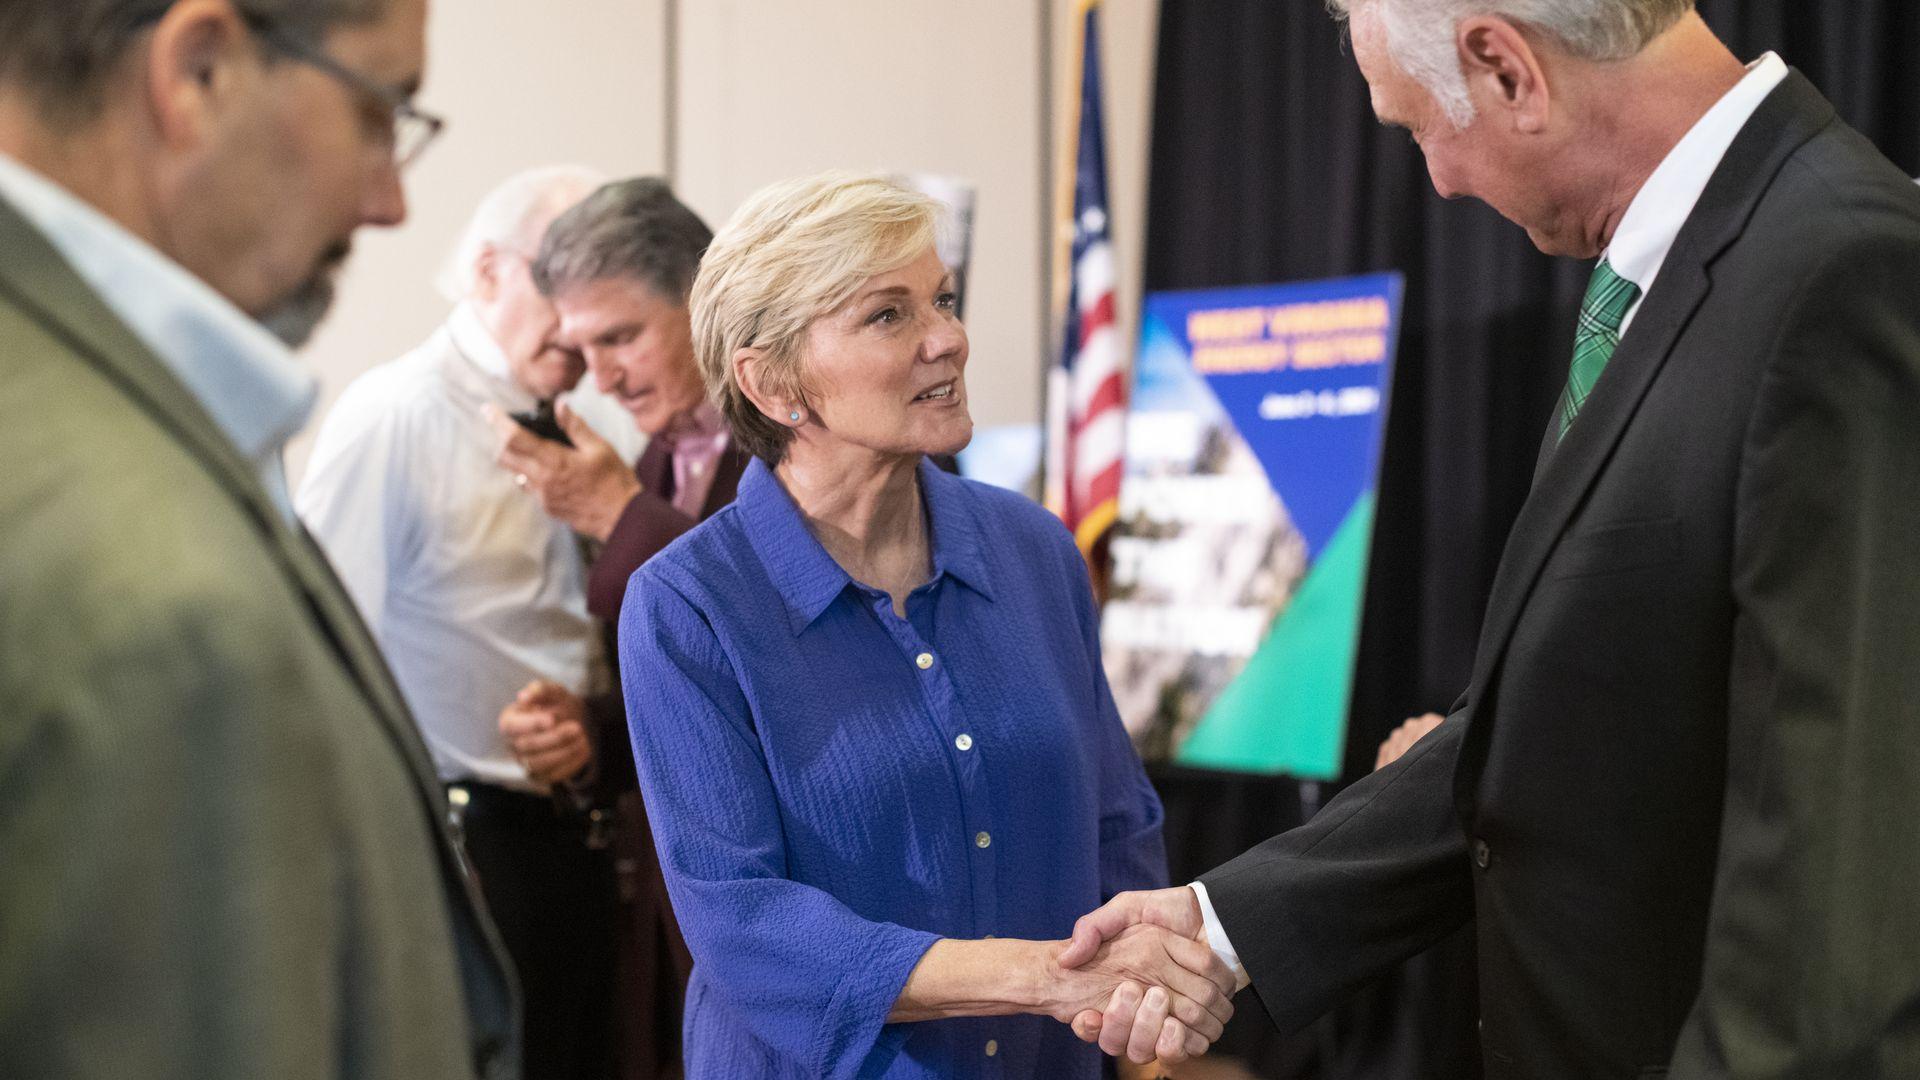 Energy Secretary Jennifer M. Granholm shakes hands at an event in West Virginia in June.